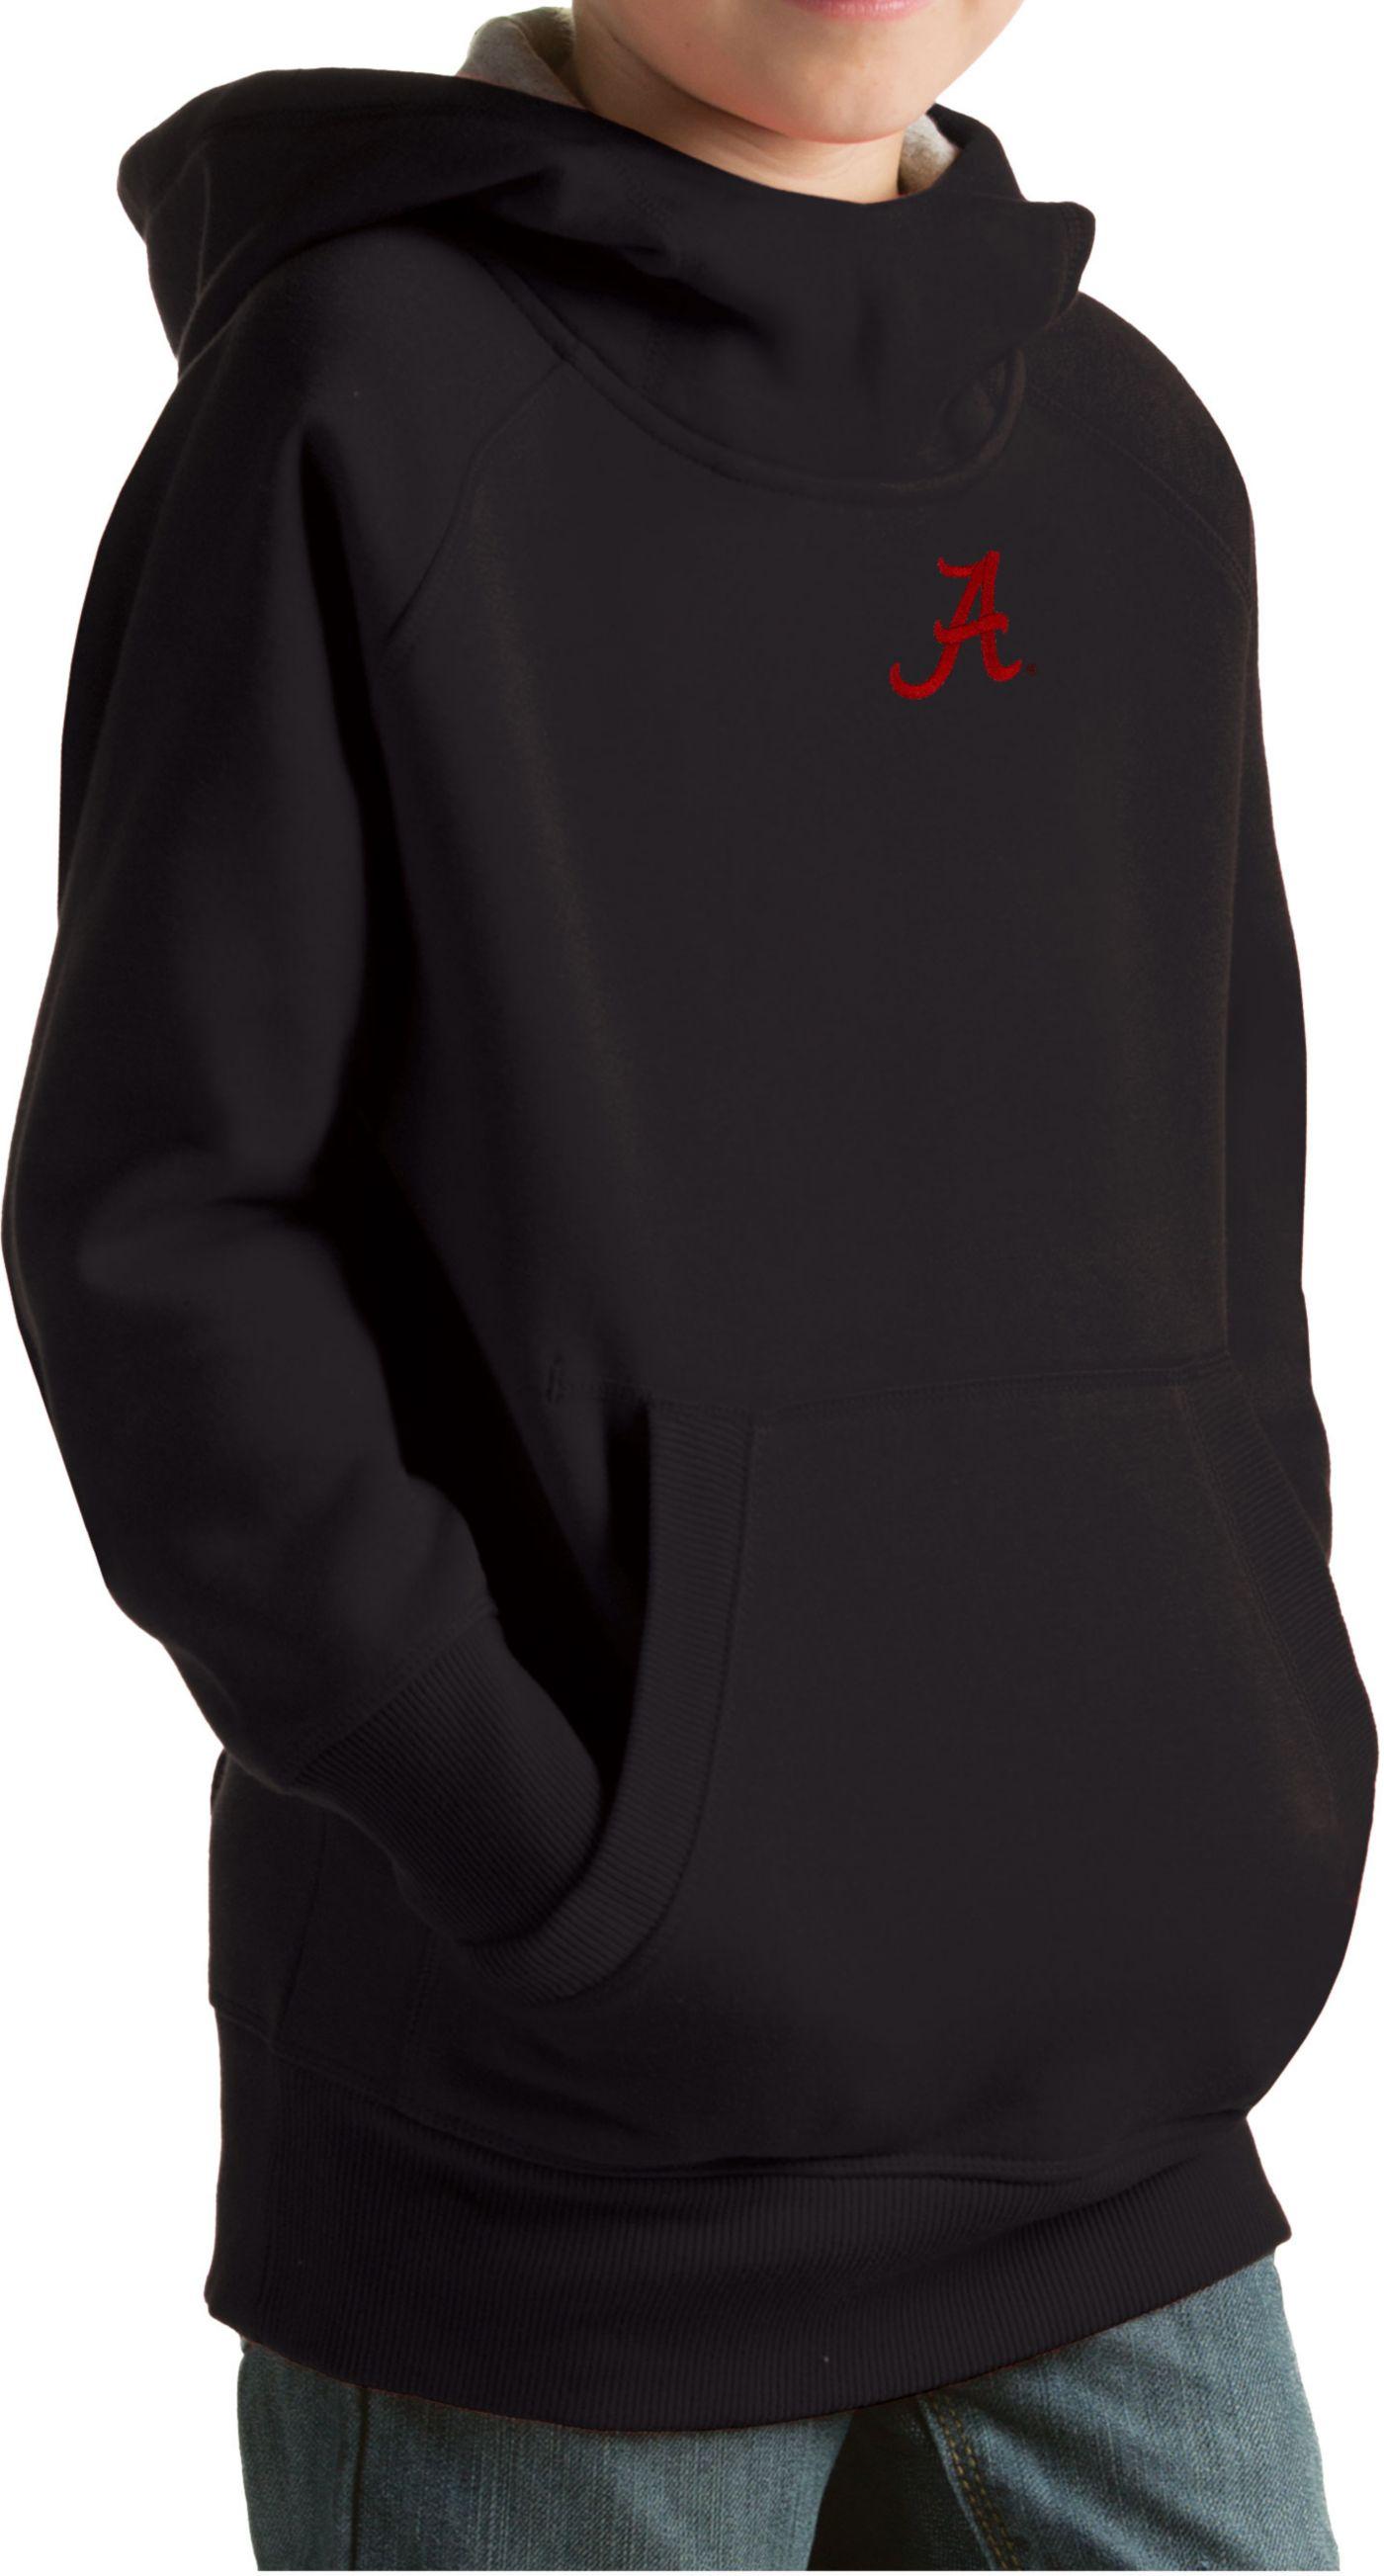 Antigua Youth Alabama Crimson Tide Black Victory Pullover Hoodie